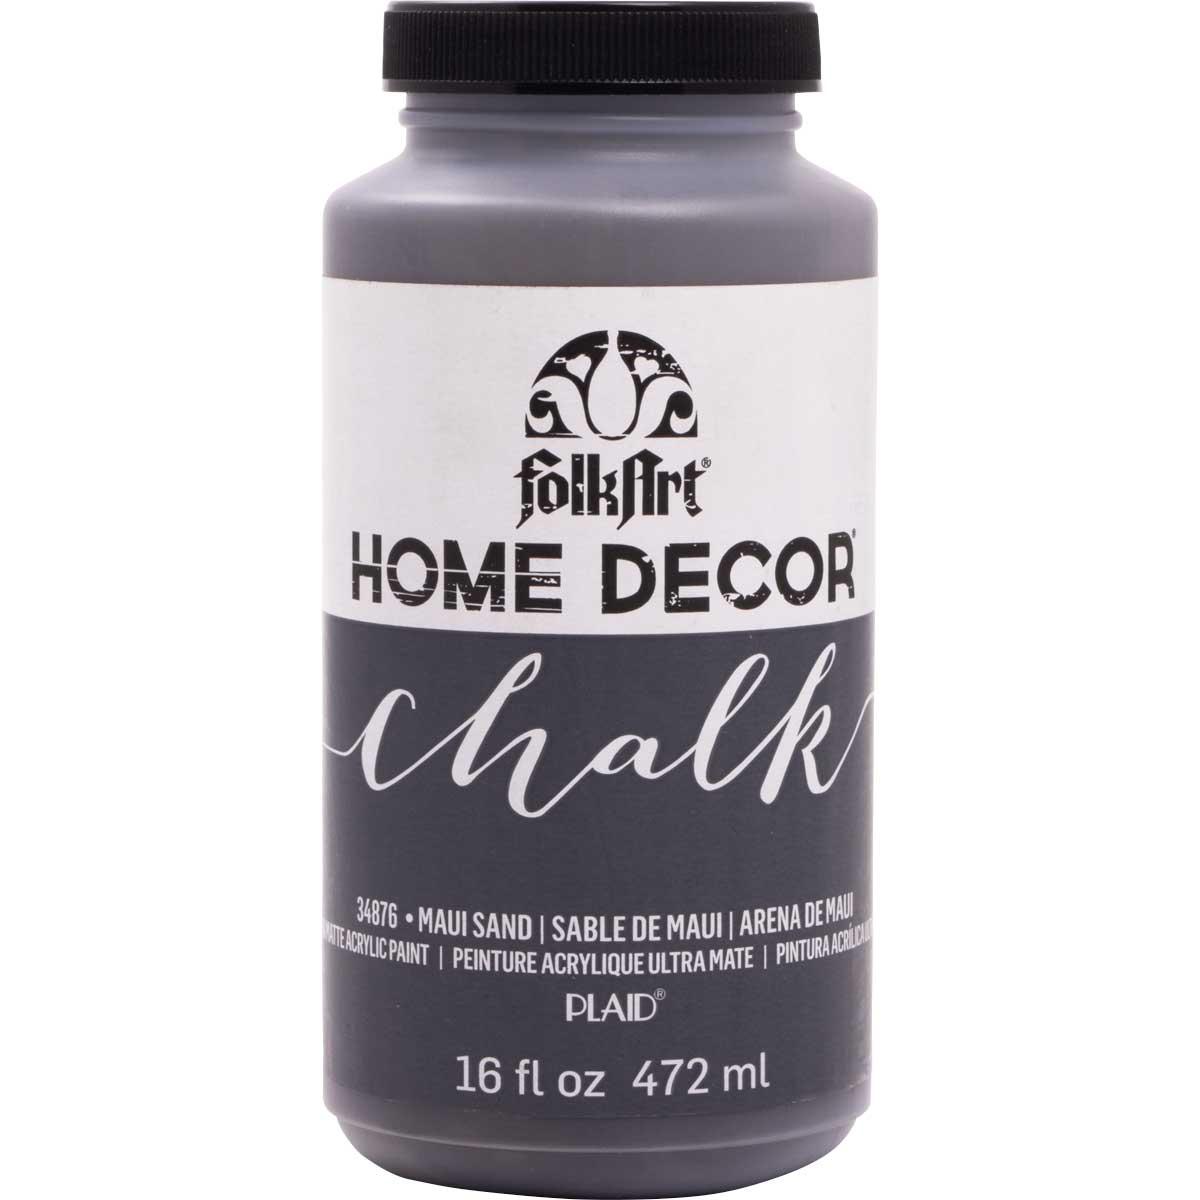 FolkArt ® Home Decor™ Chalk - Maui Sand, 16 oz.